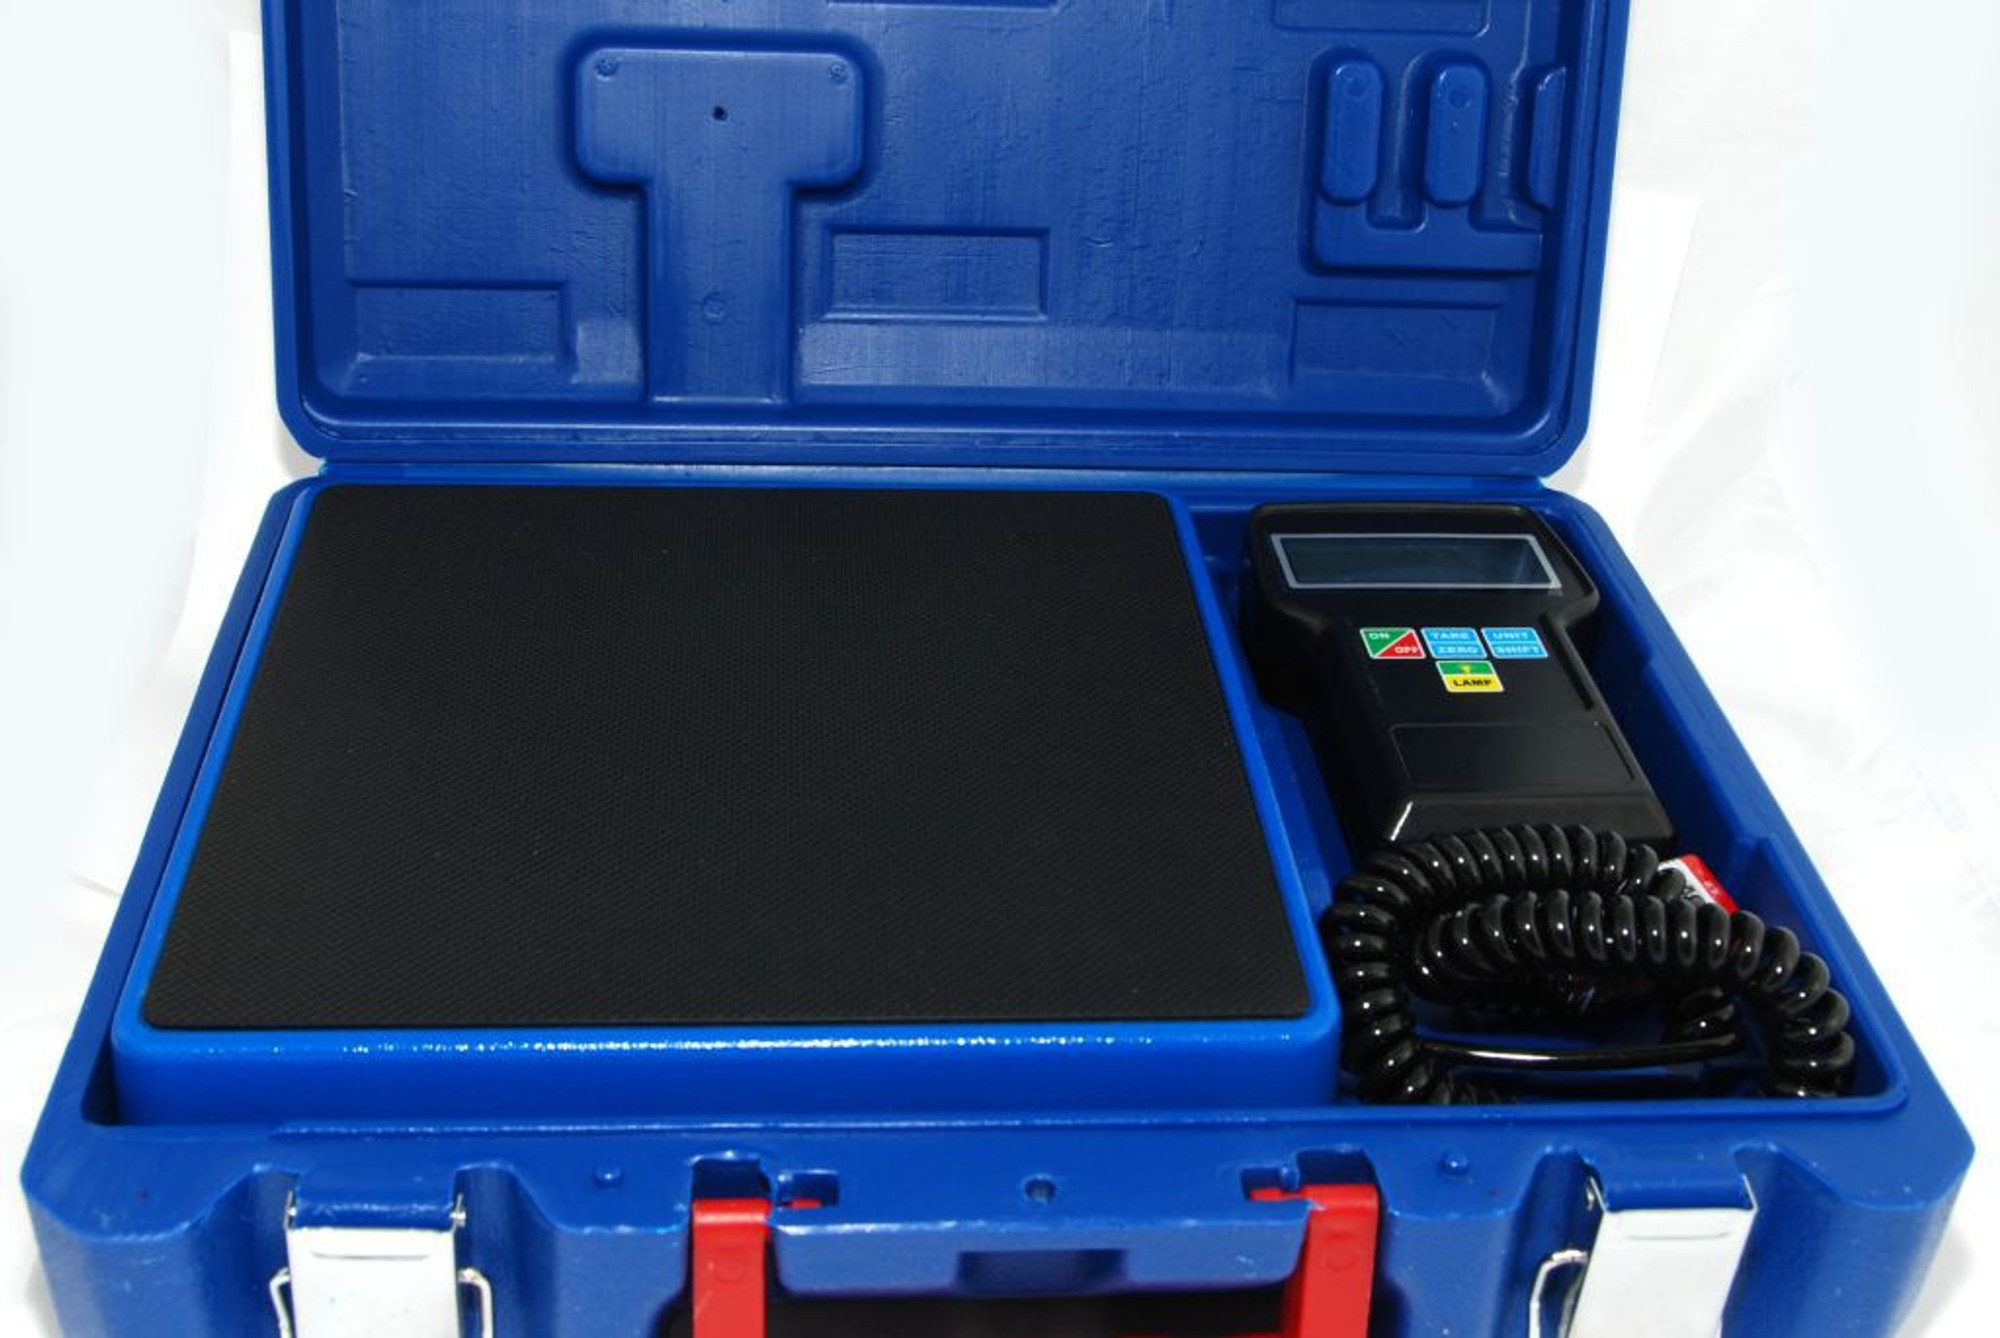 Kältemittelwaage elektrisch RCS-50, 50kg, Klimaanlage, refrigerant ...